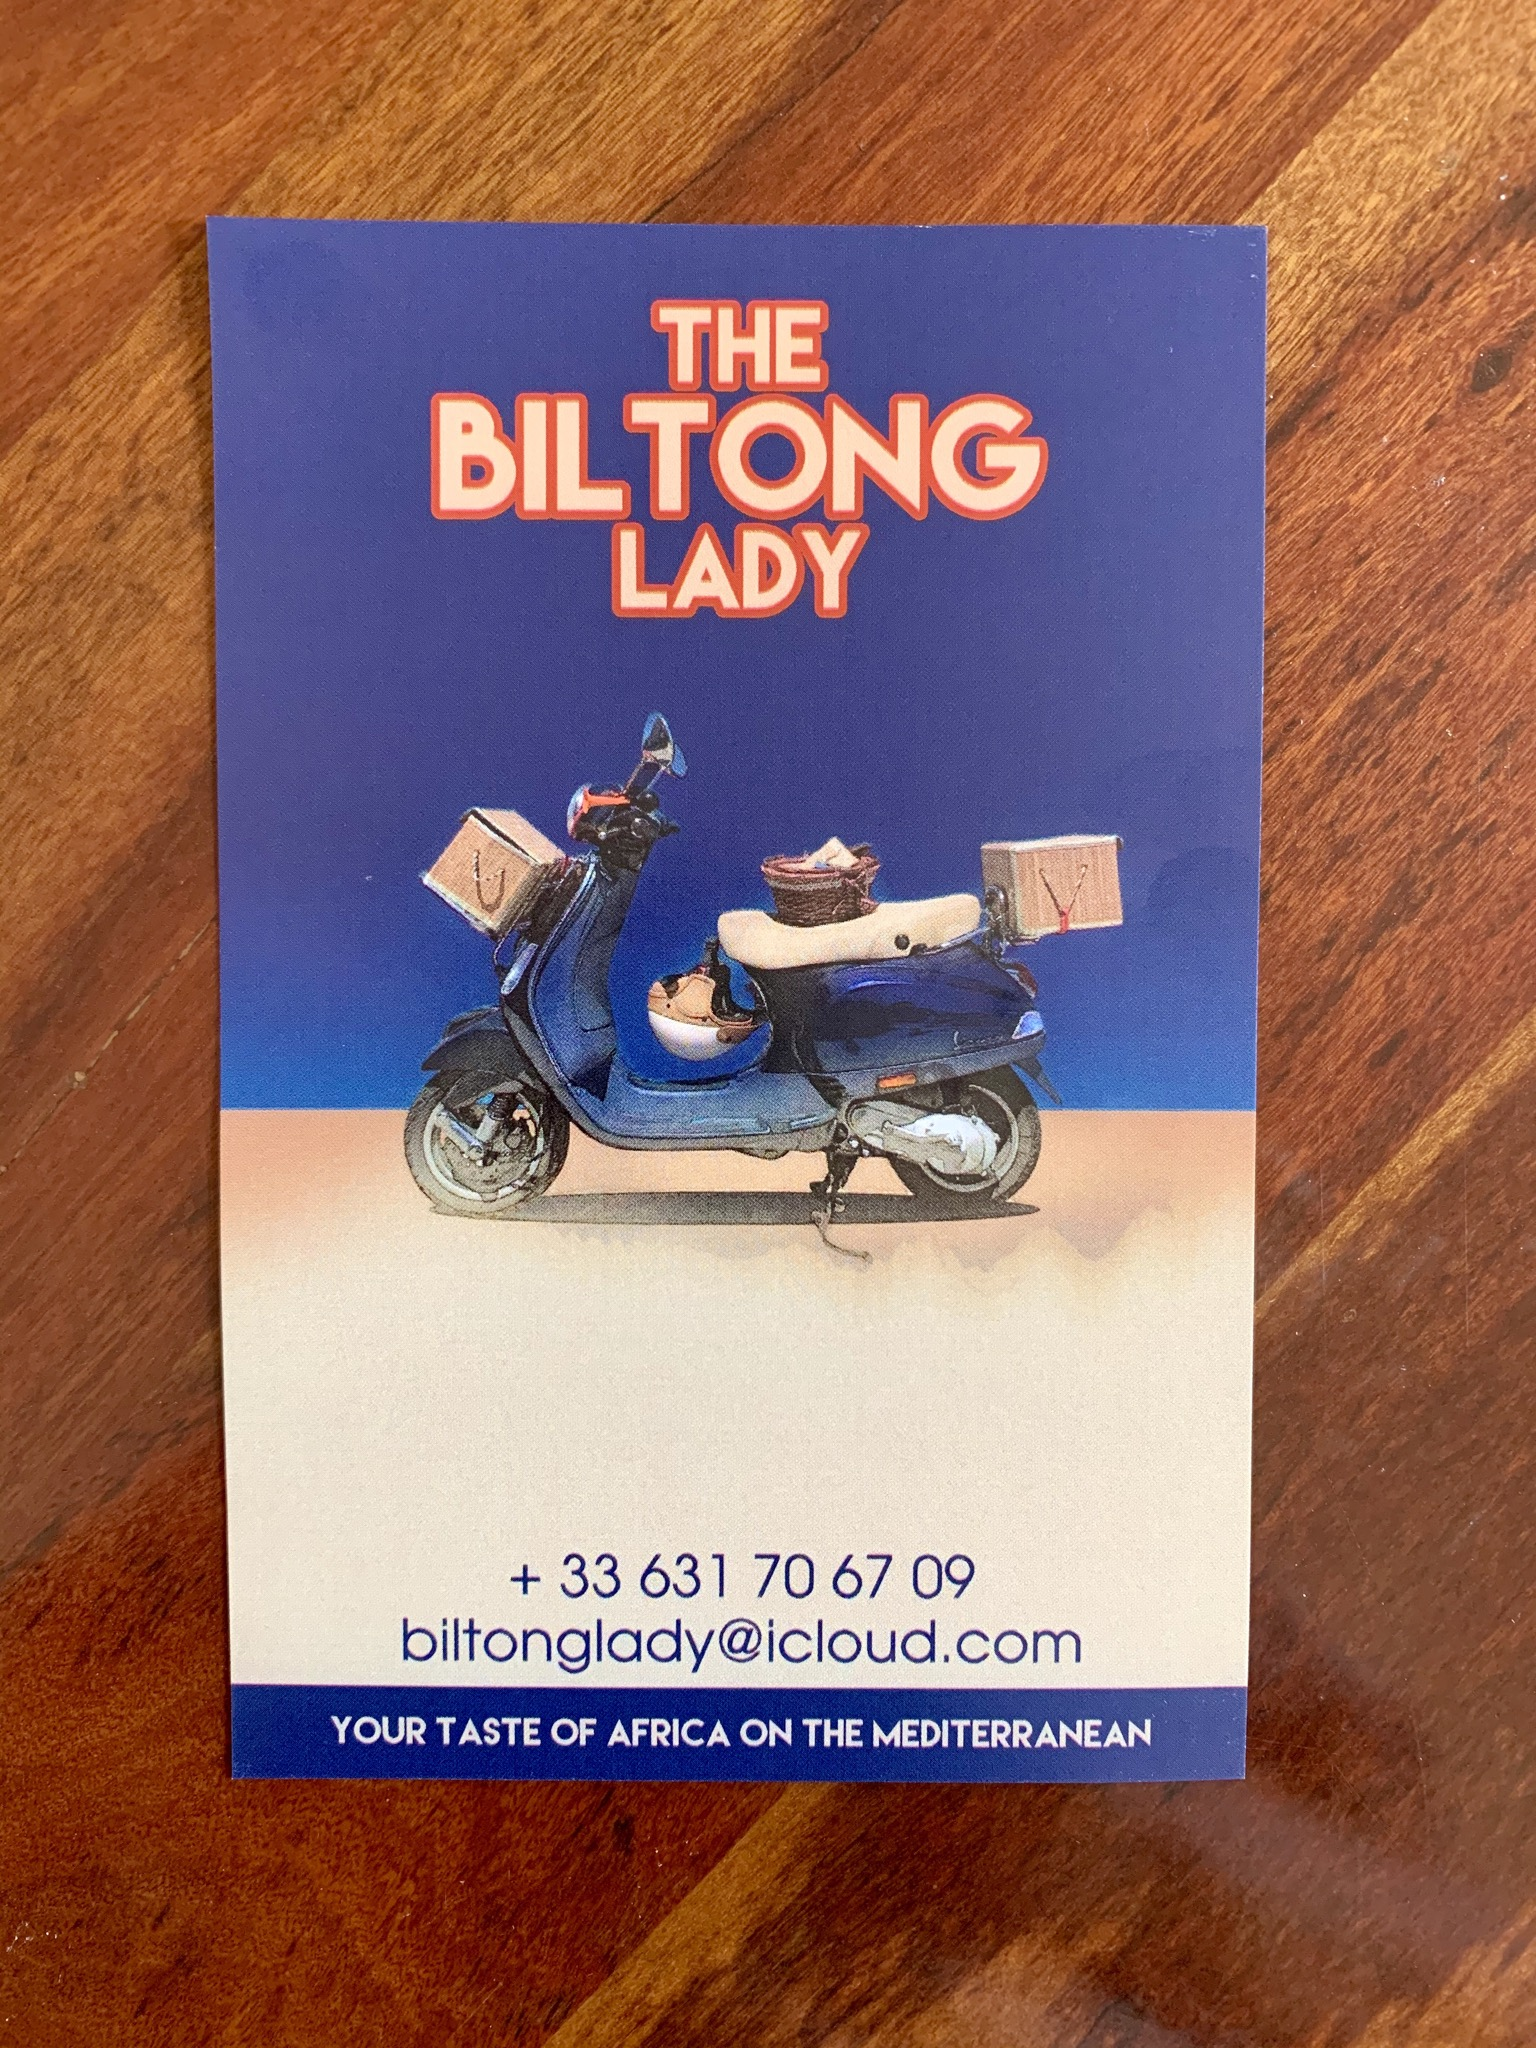 THE BILTONG LADY